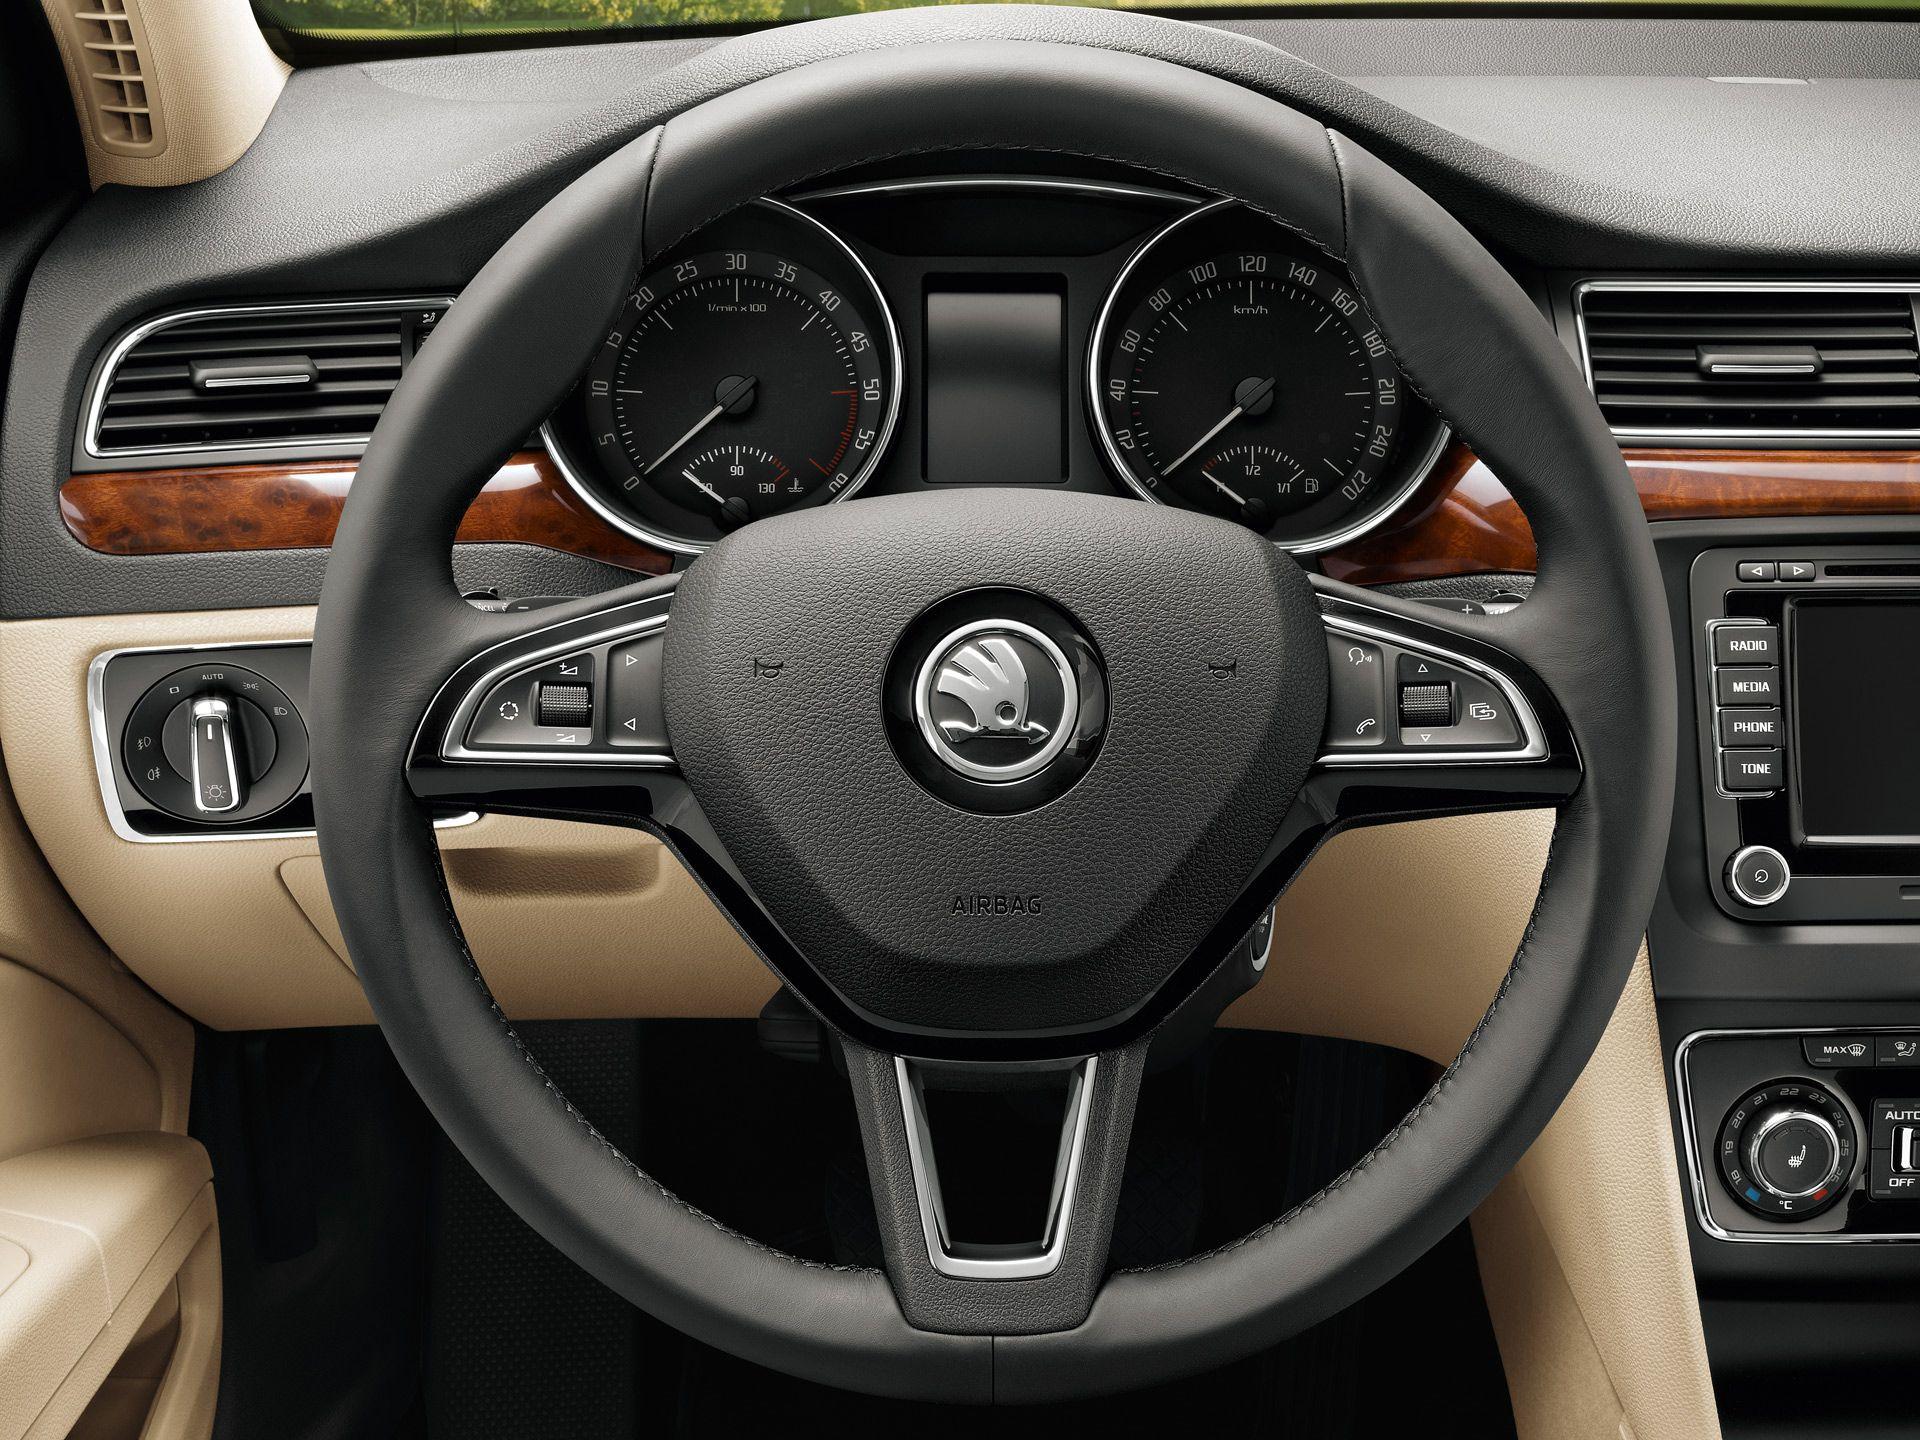 Skoda Steering Wheel Superb Black Multifunction Leather Interior